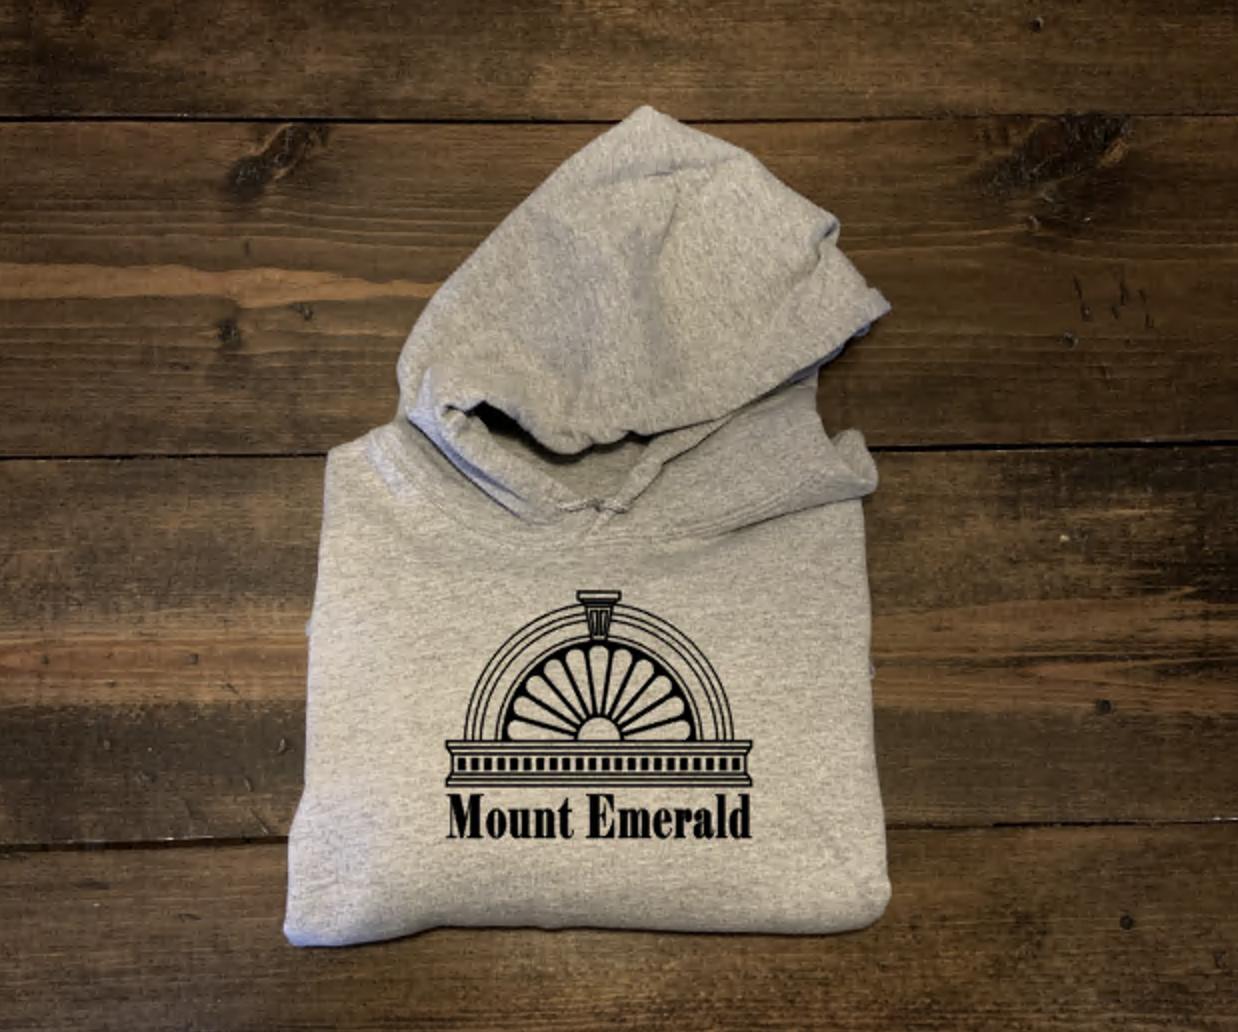 Mount Emerald, part of the Near South neighborhood, screen printed hoodie